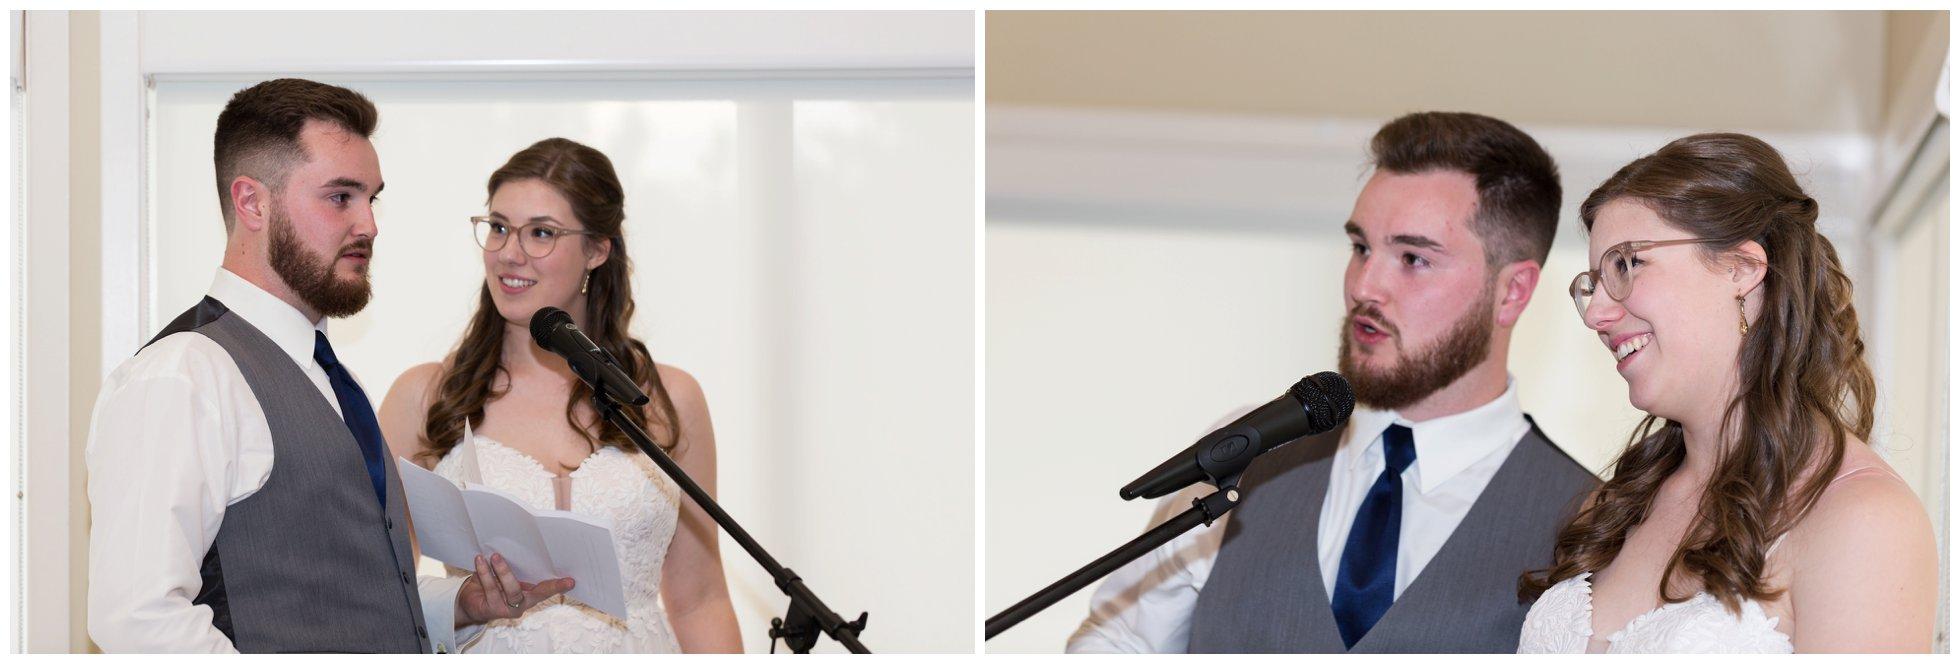 Emily and Royden Edmonton Wedding (Life by Selena Photography)_0056.jpg